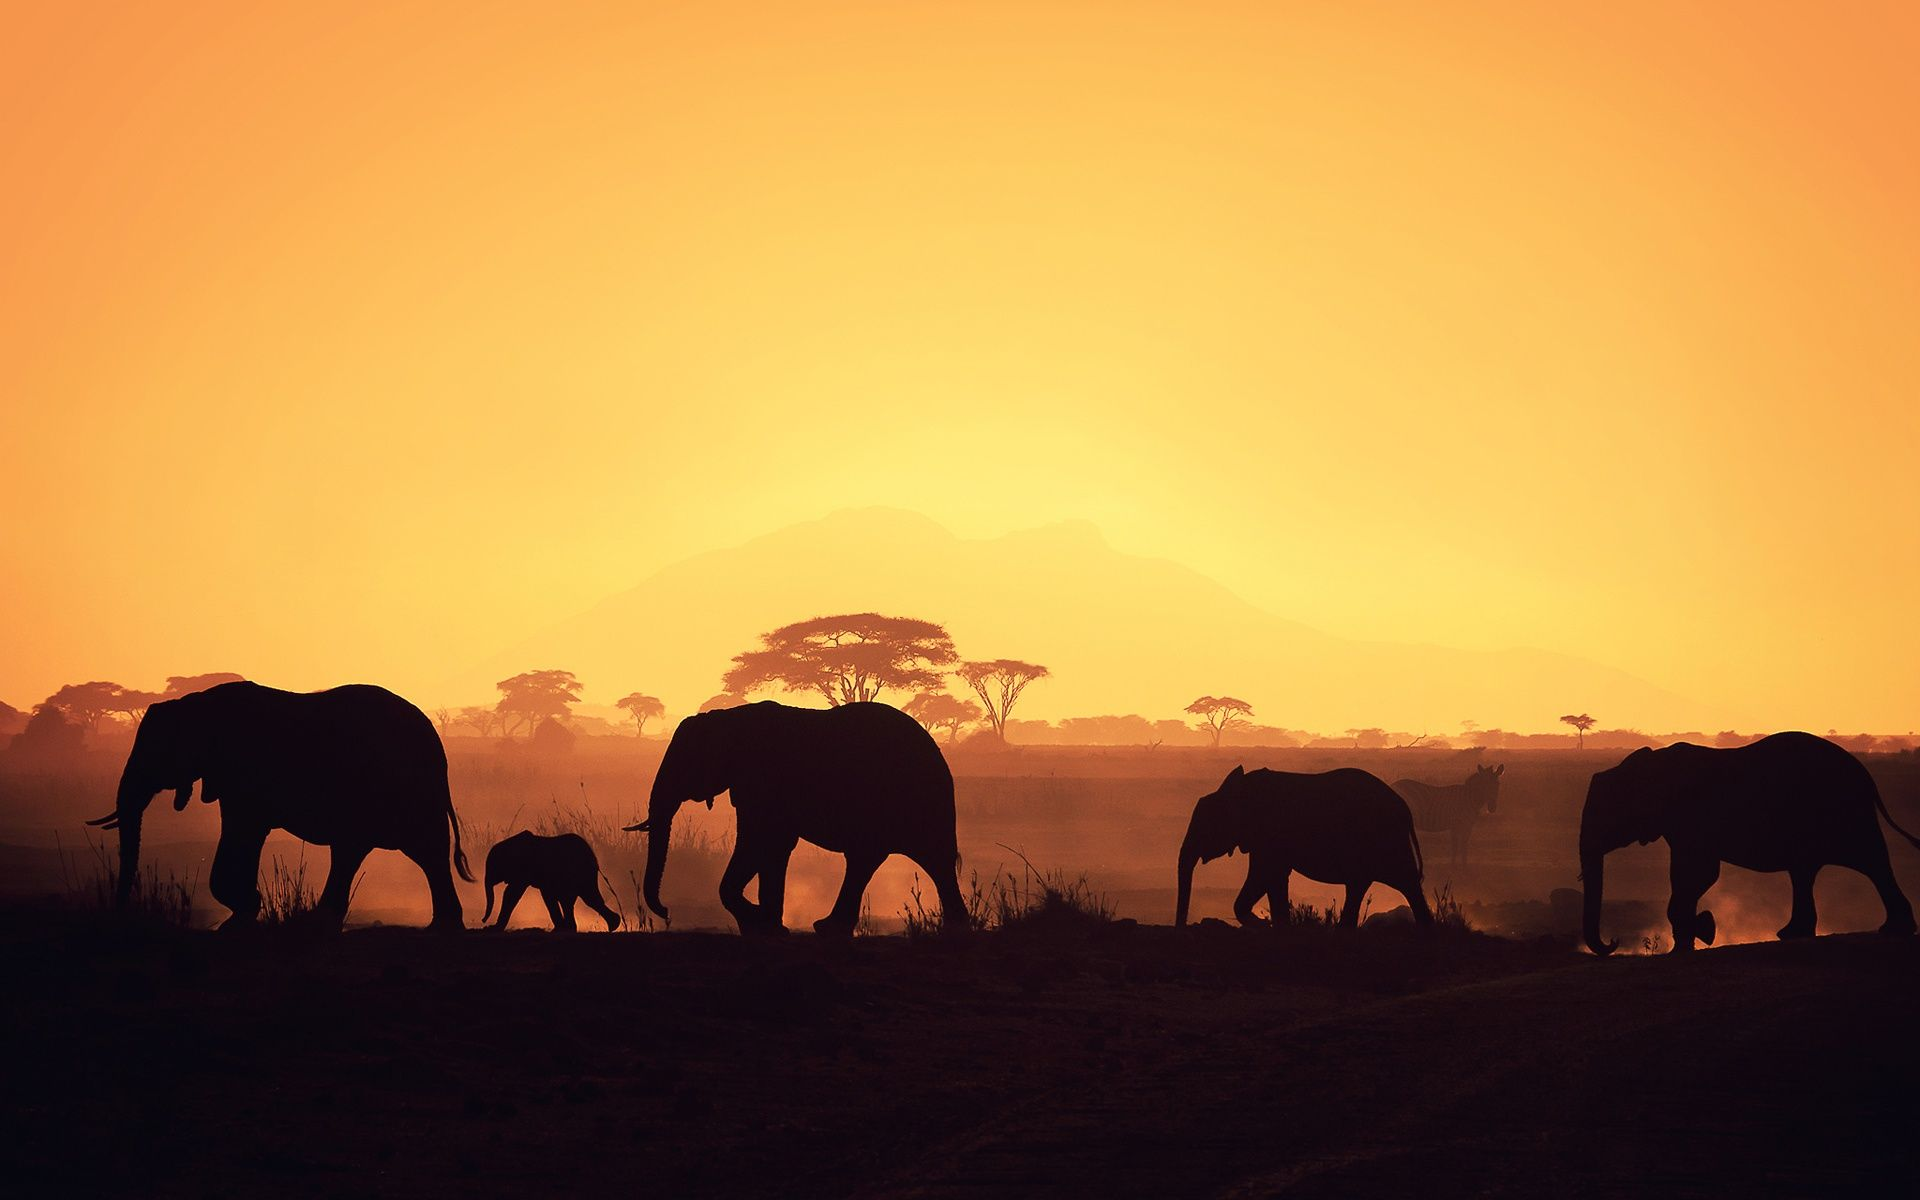 Full Hd P Africa Wallpapers Hd Desktop Backgrounds X Africa Silhouette Elephant Wallpaper African Elephant